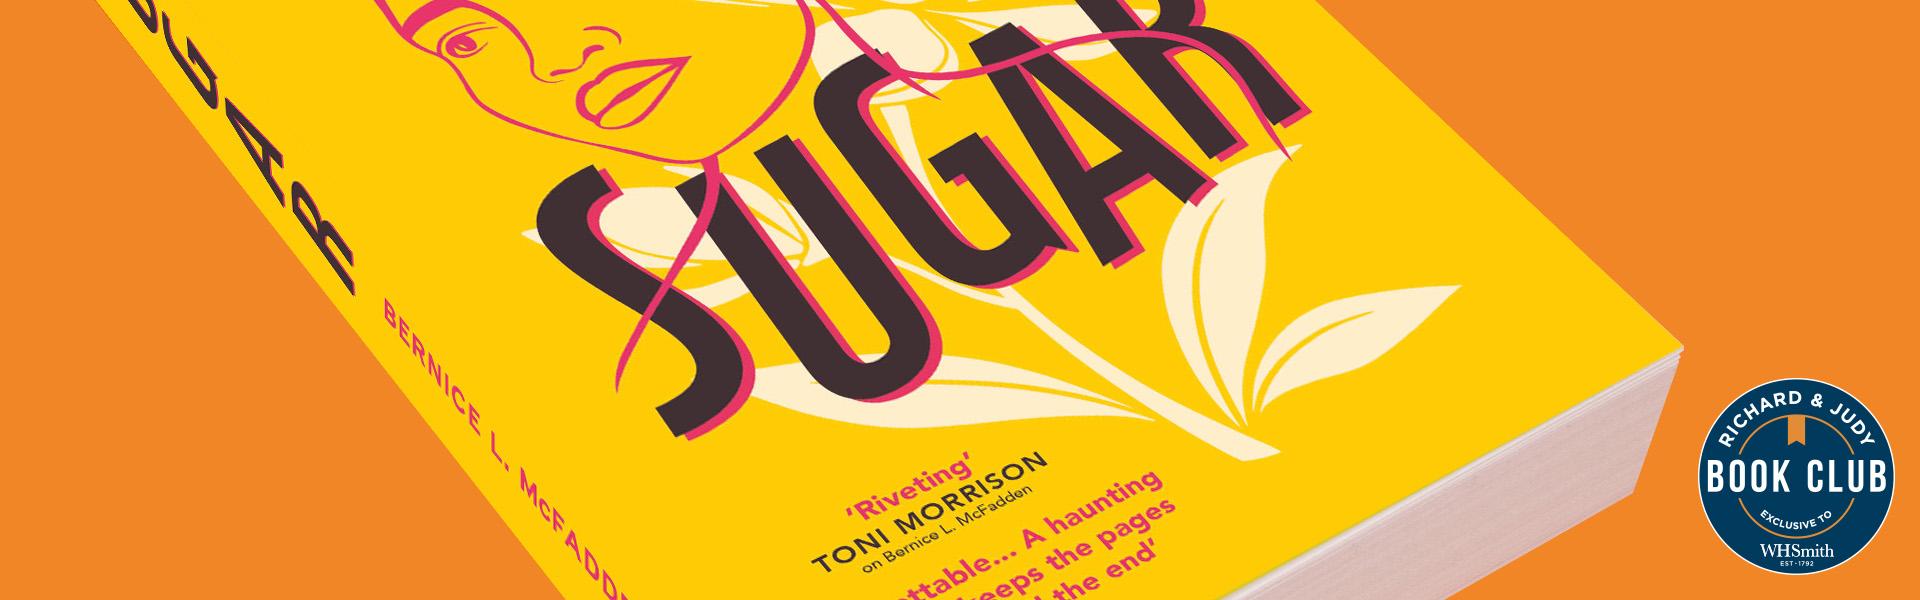 Richard & Judy Introduce Sugar Bernice by McFaddon